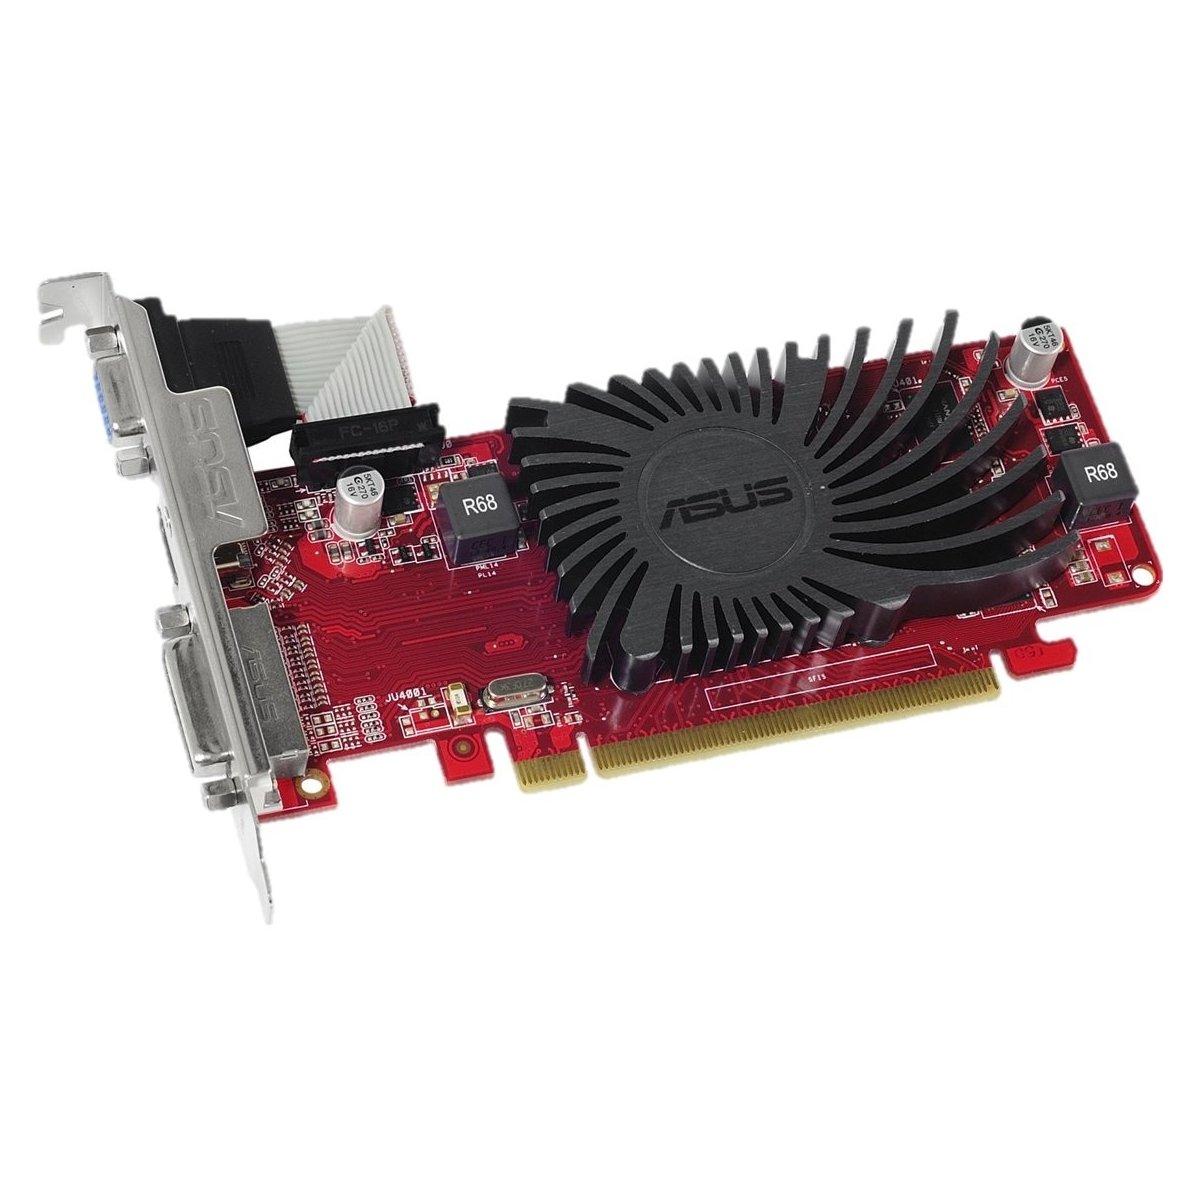 Amazon.com: Asus R5230-SL-1GD3-L Graphics card - Radeon R5 ...